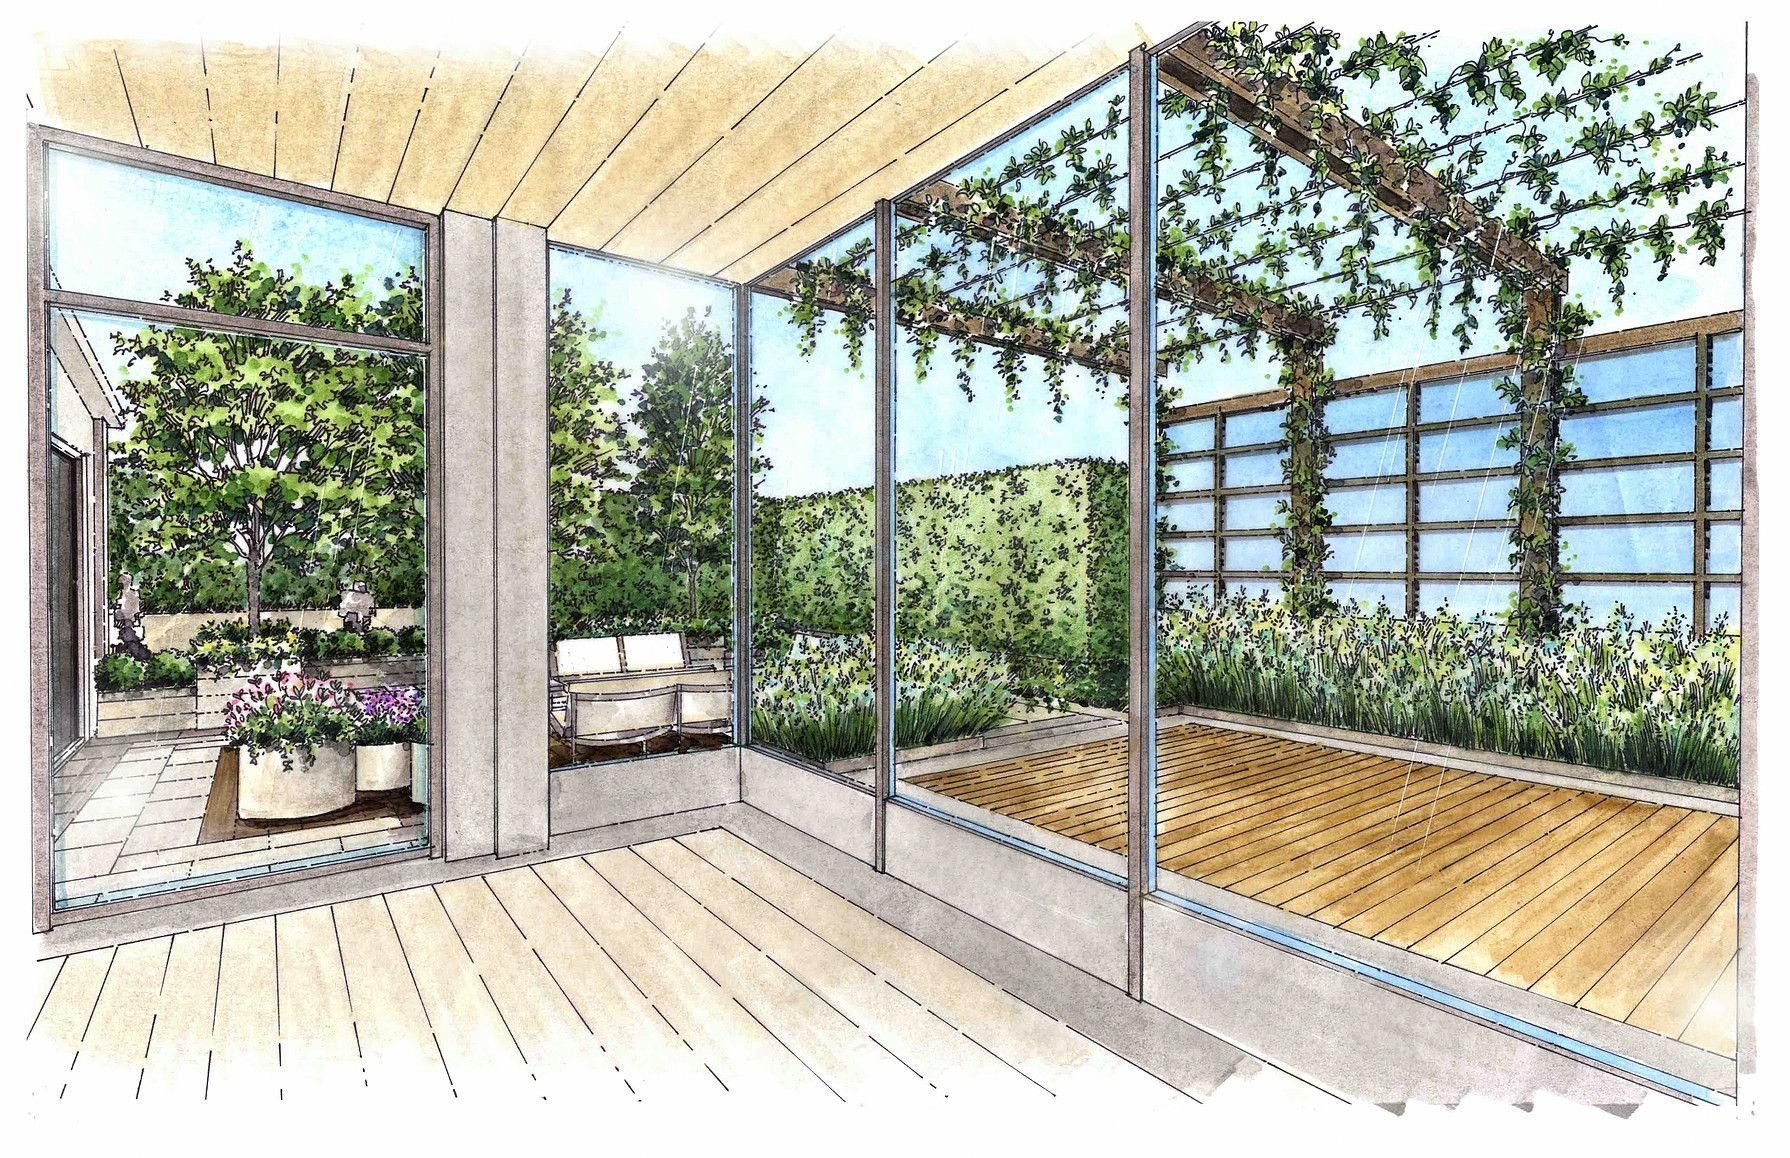 Landscape Gardening Course Nottingham # ...